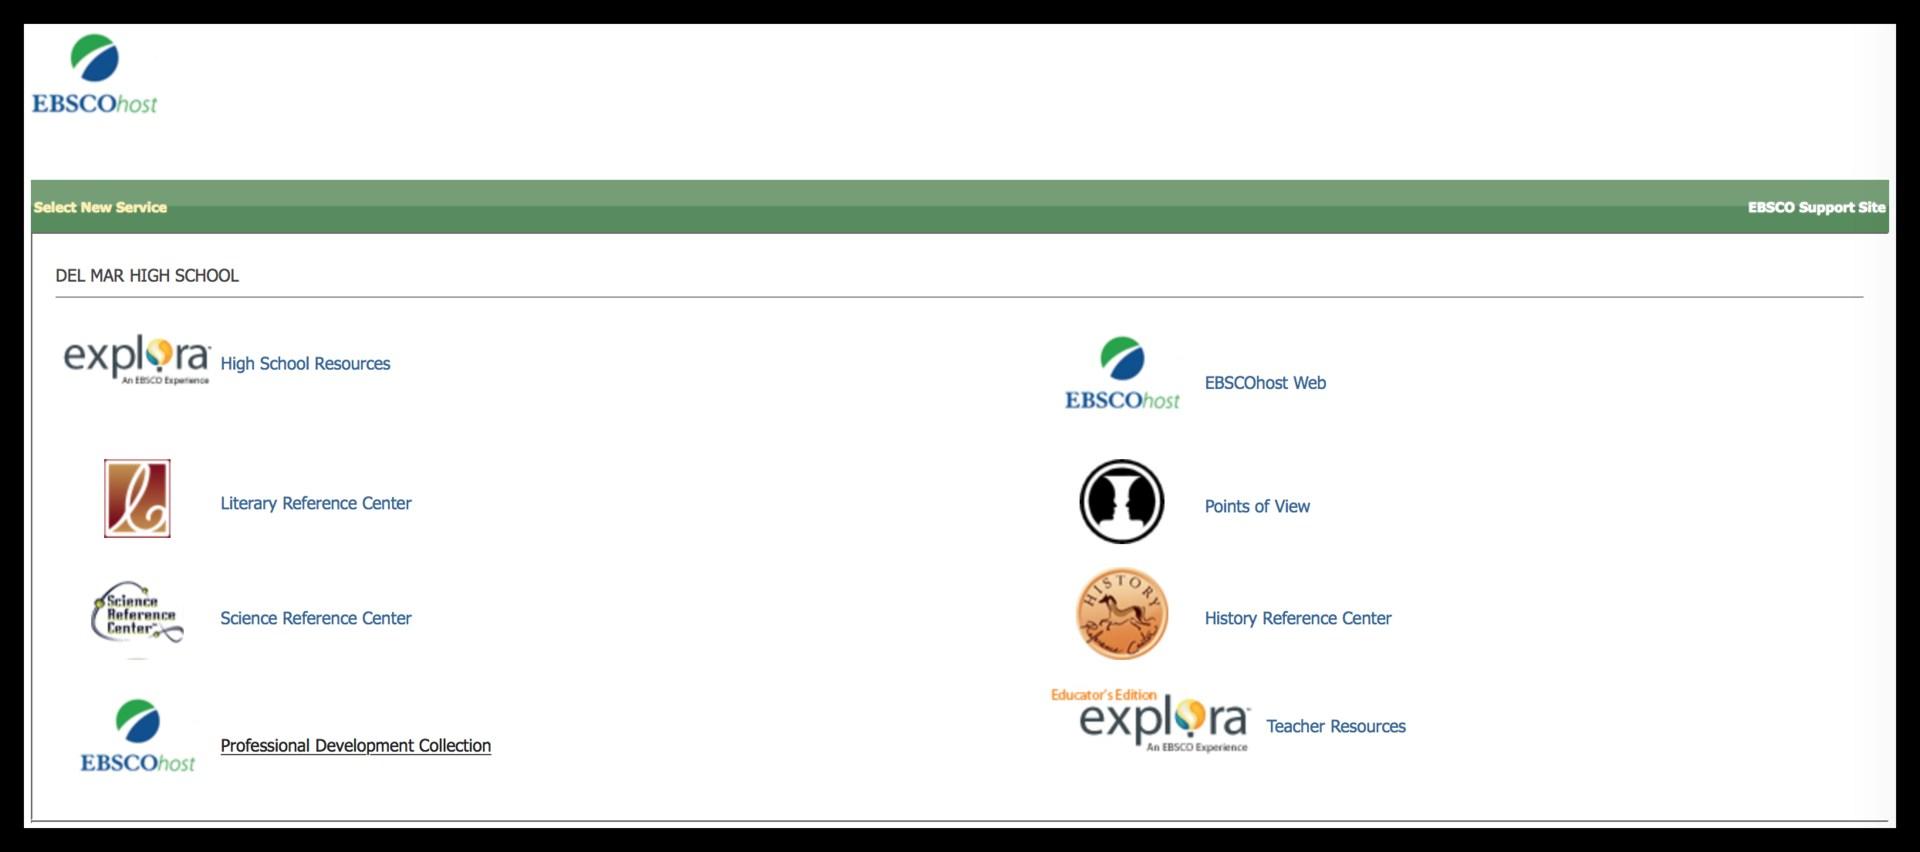 Image of EBSCOhost website landing page